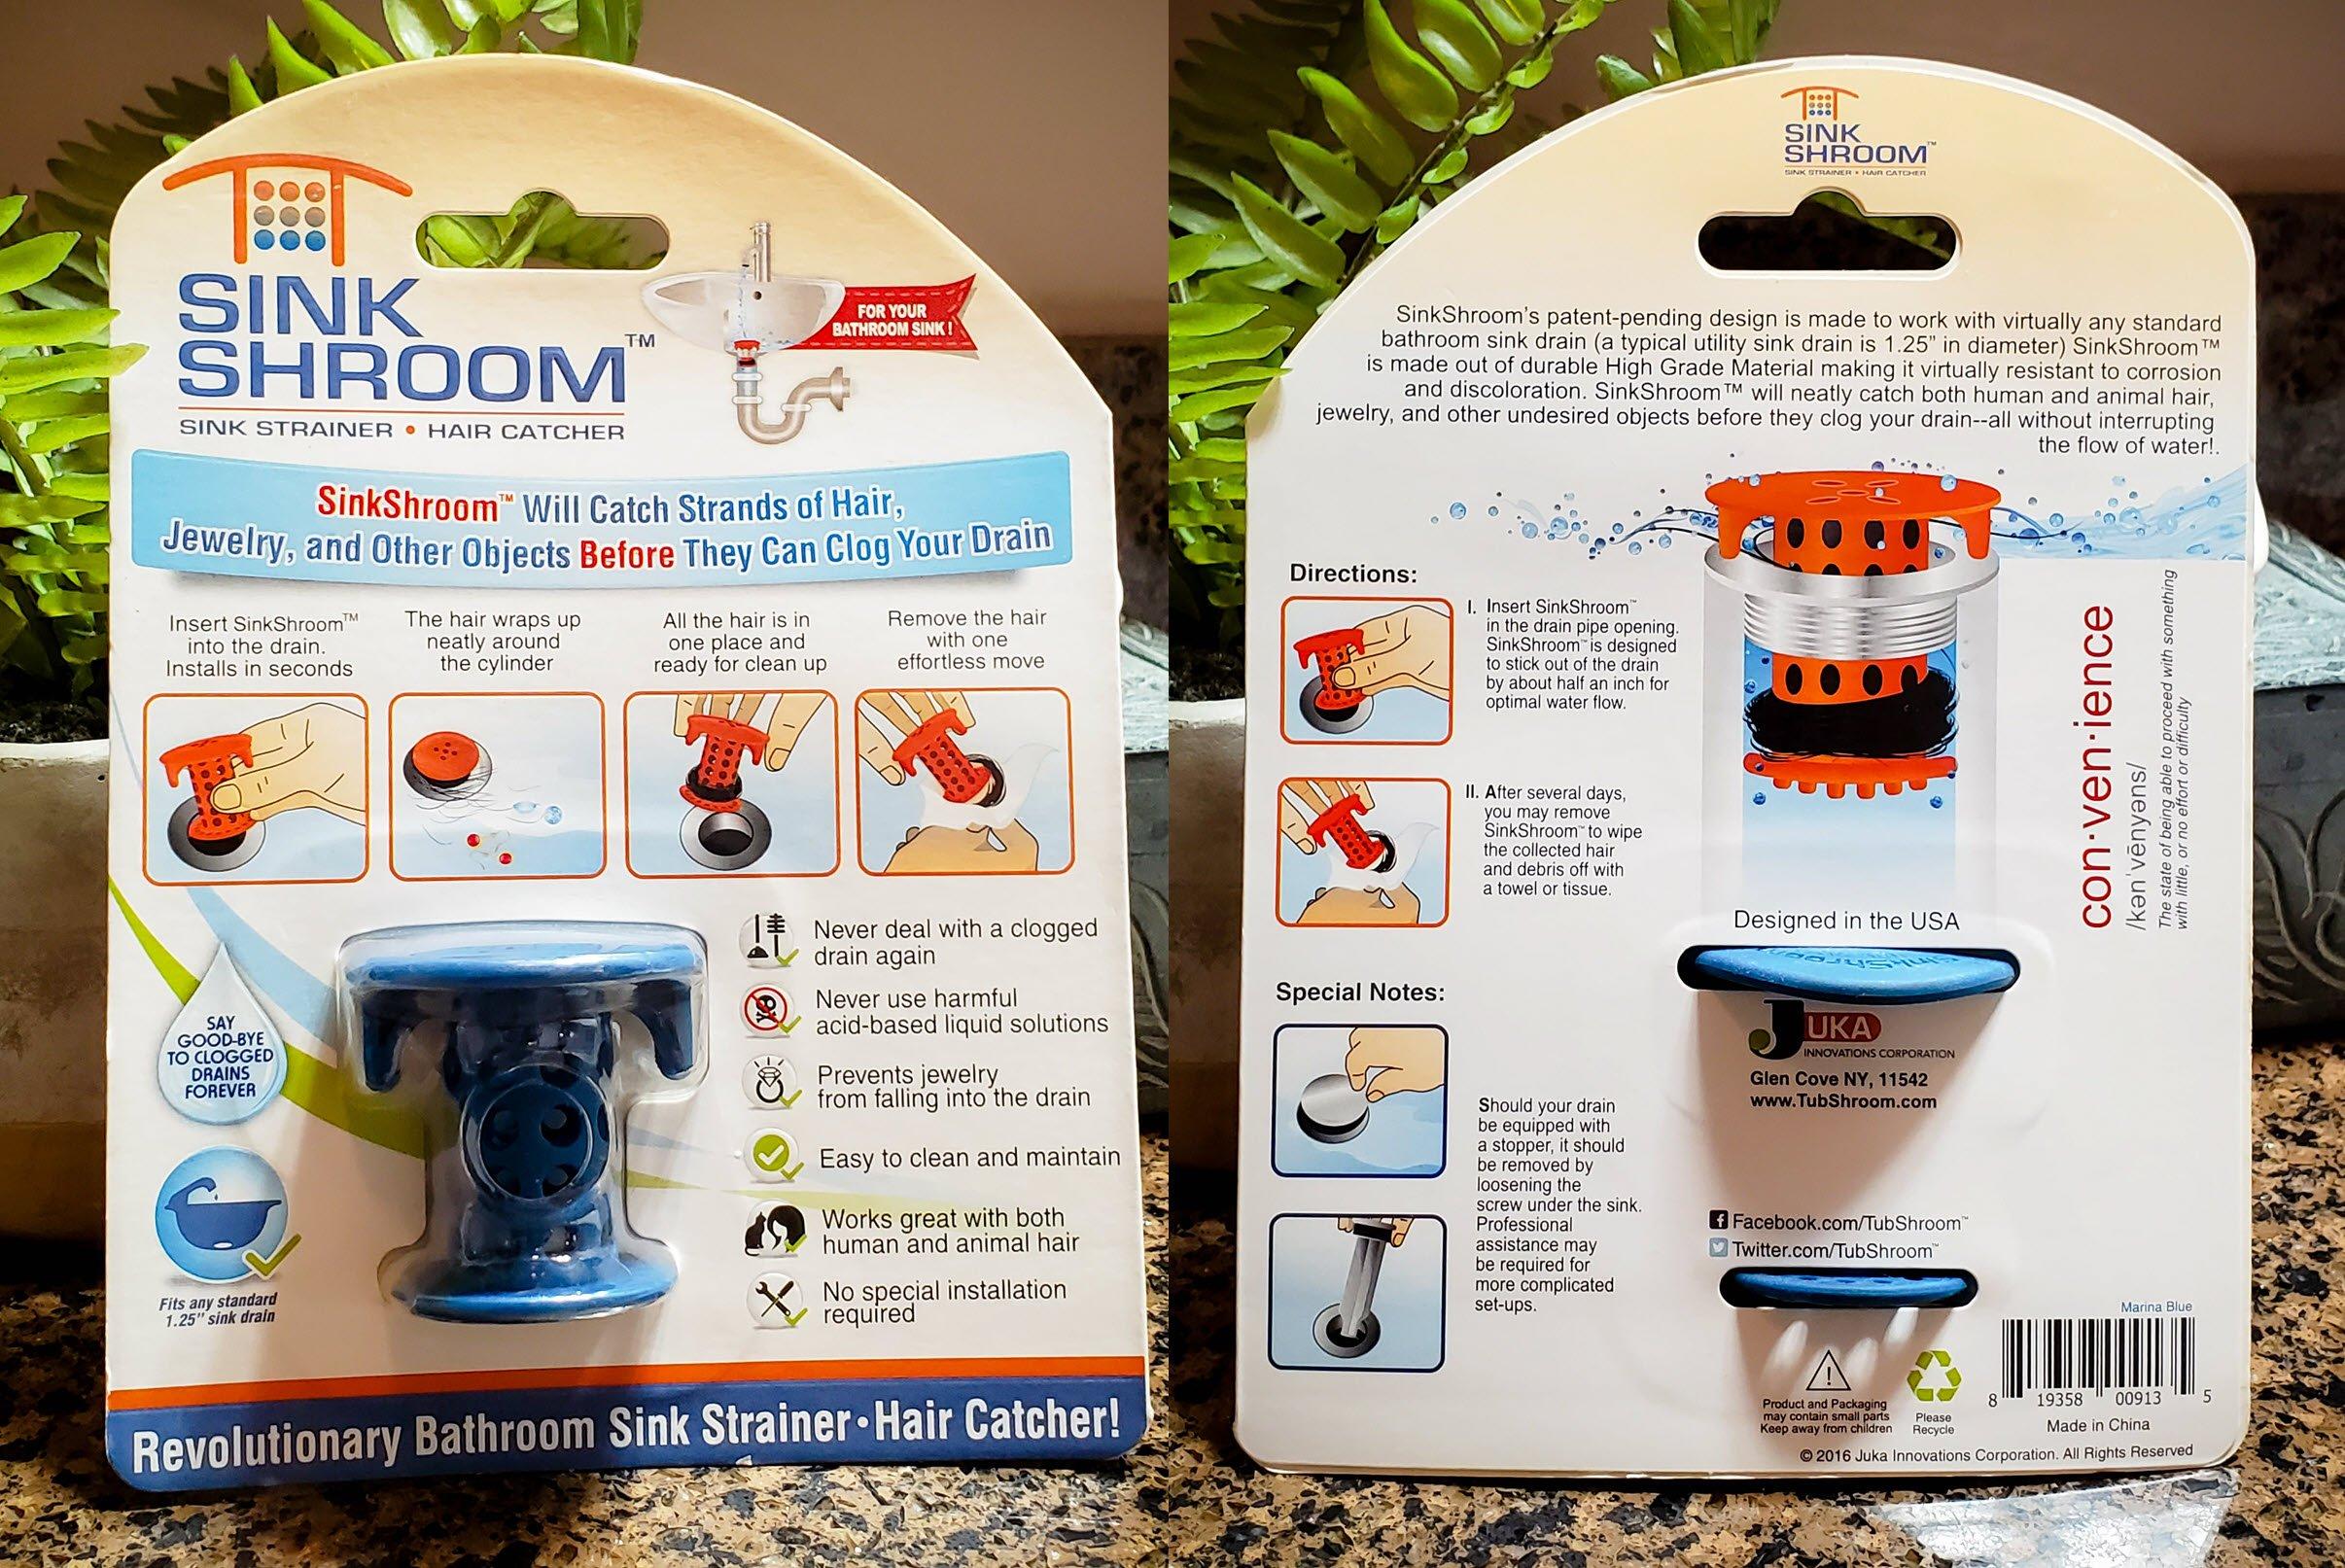 SINKSHROOM® (BLUE) THE HAIR CATCHER THAT PREVENTS CLOGGED BATHROOM SINK DRAINS